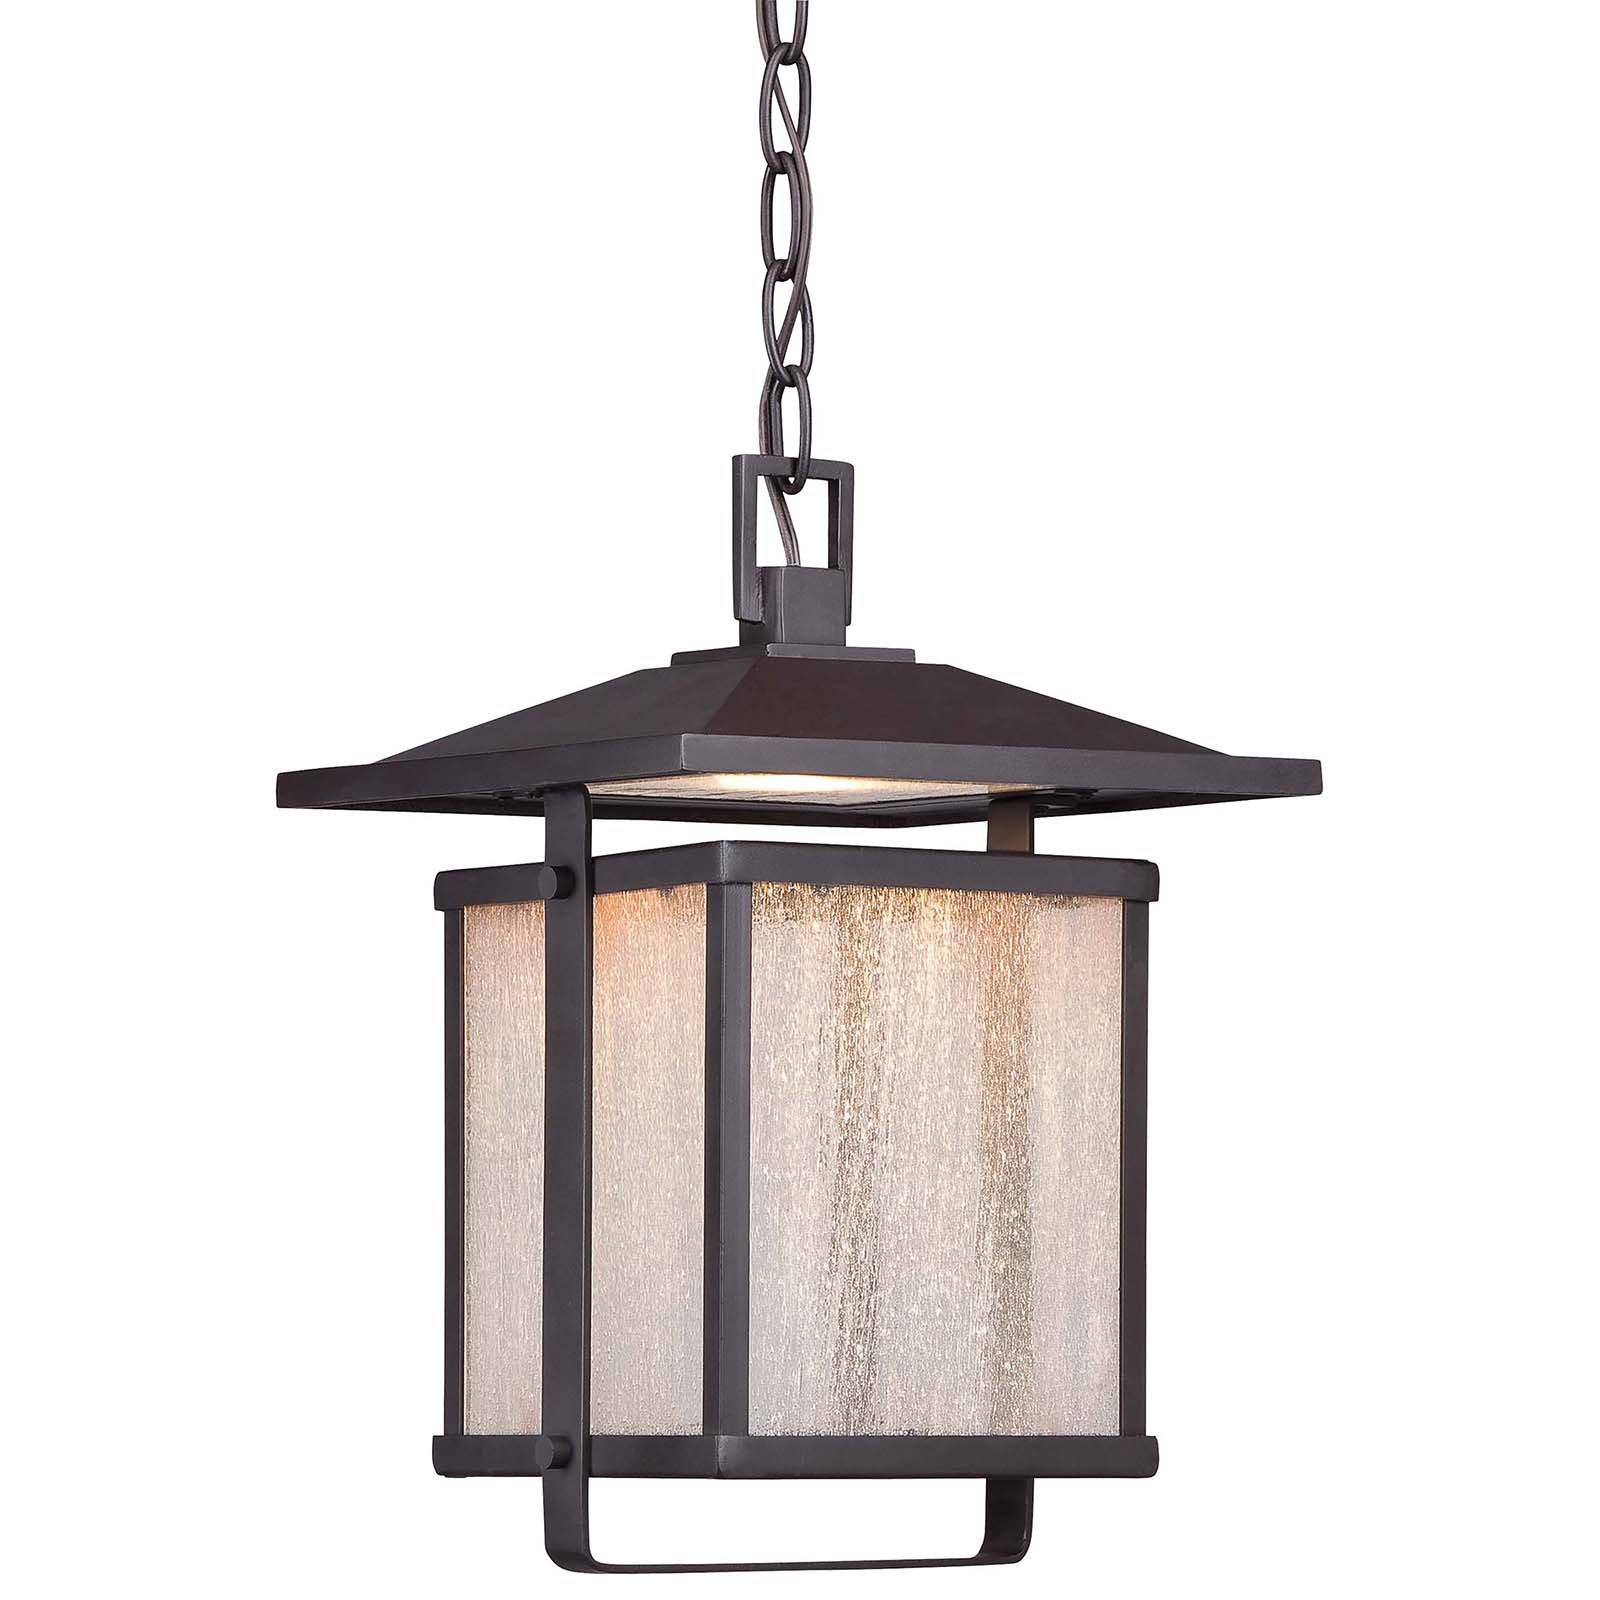 Minka Lavery Hillsdale 8164-615B-L Outdoor Hanging Light